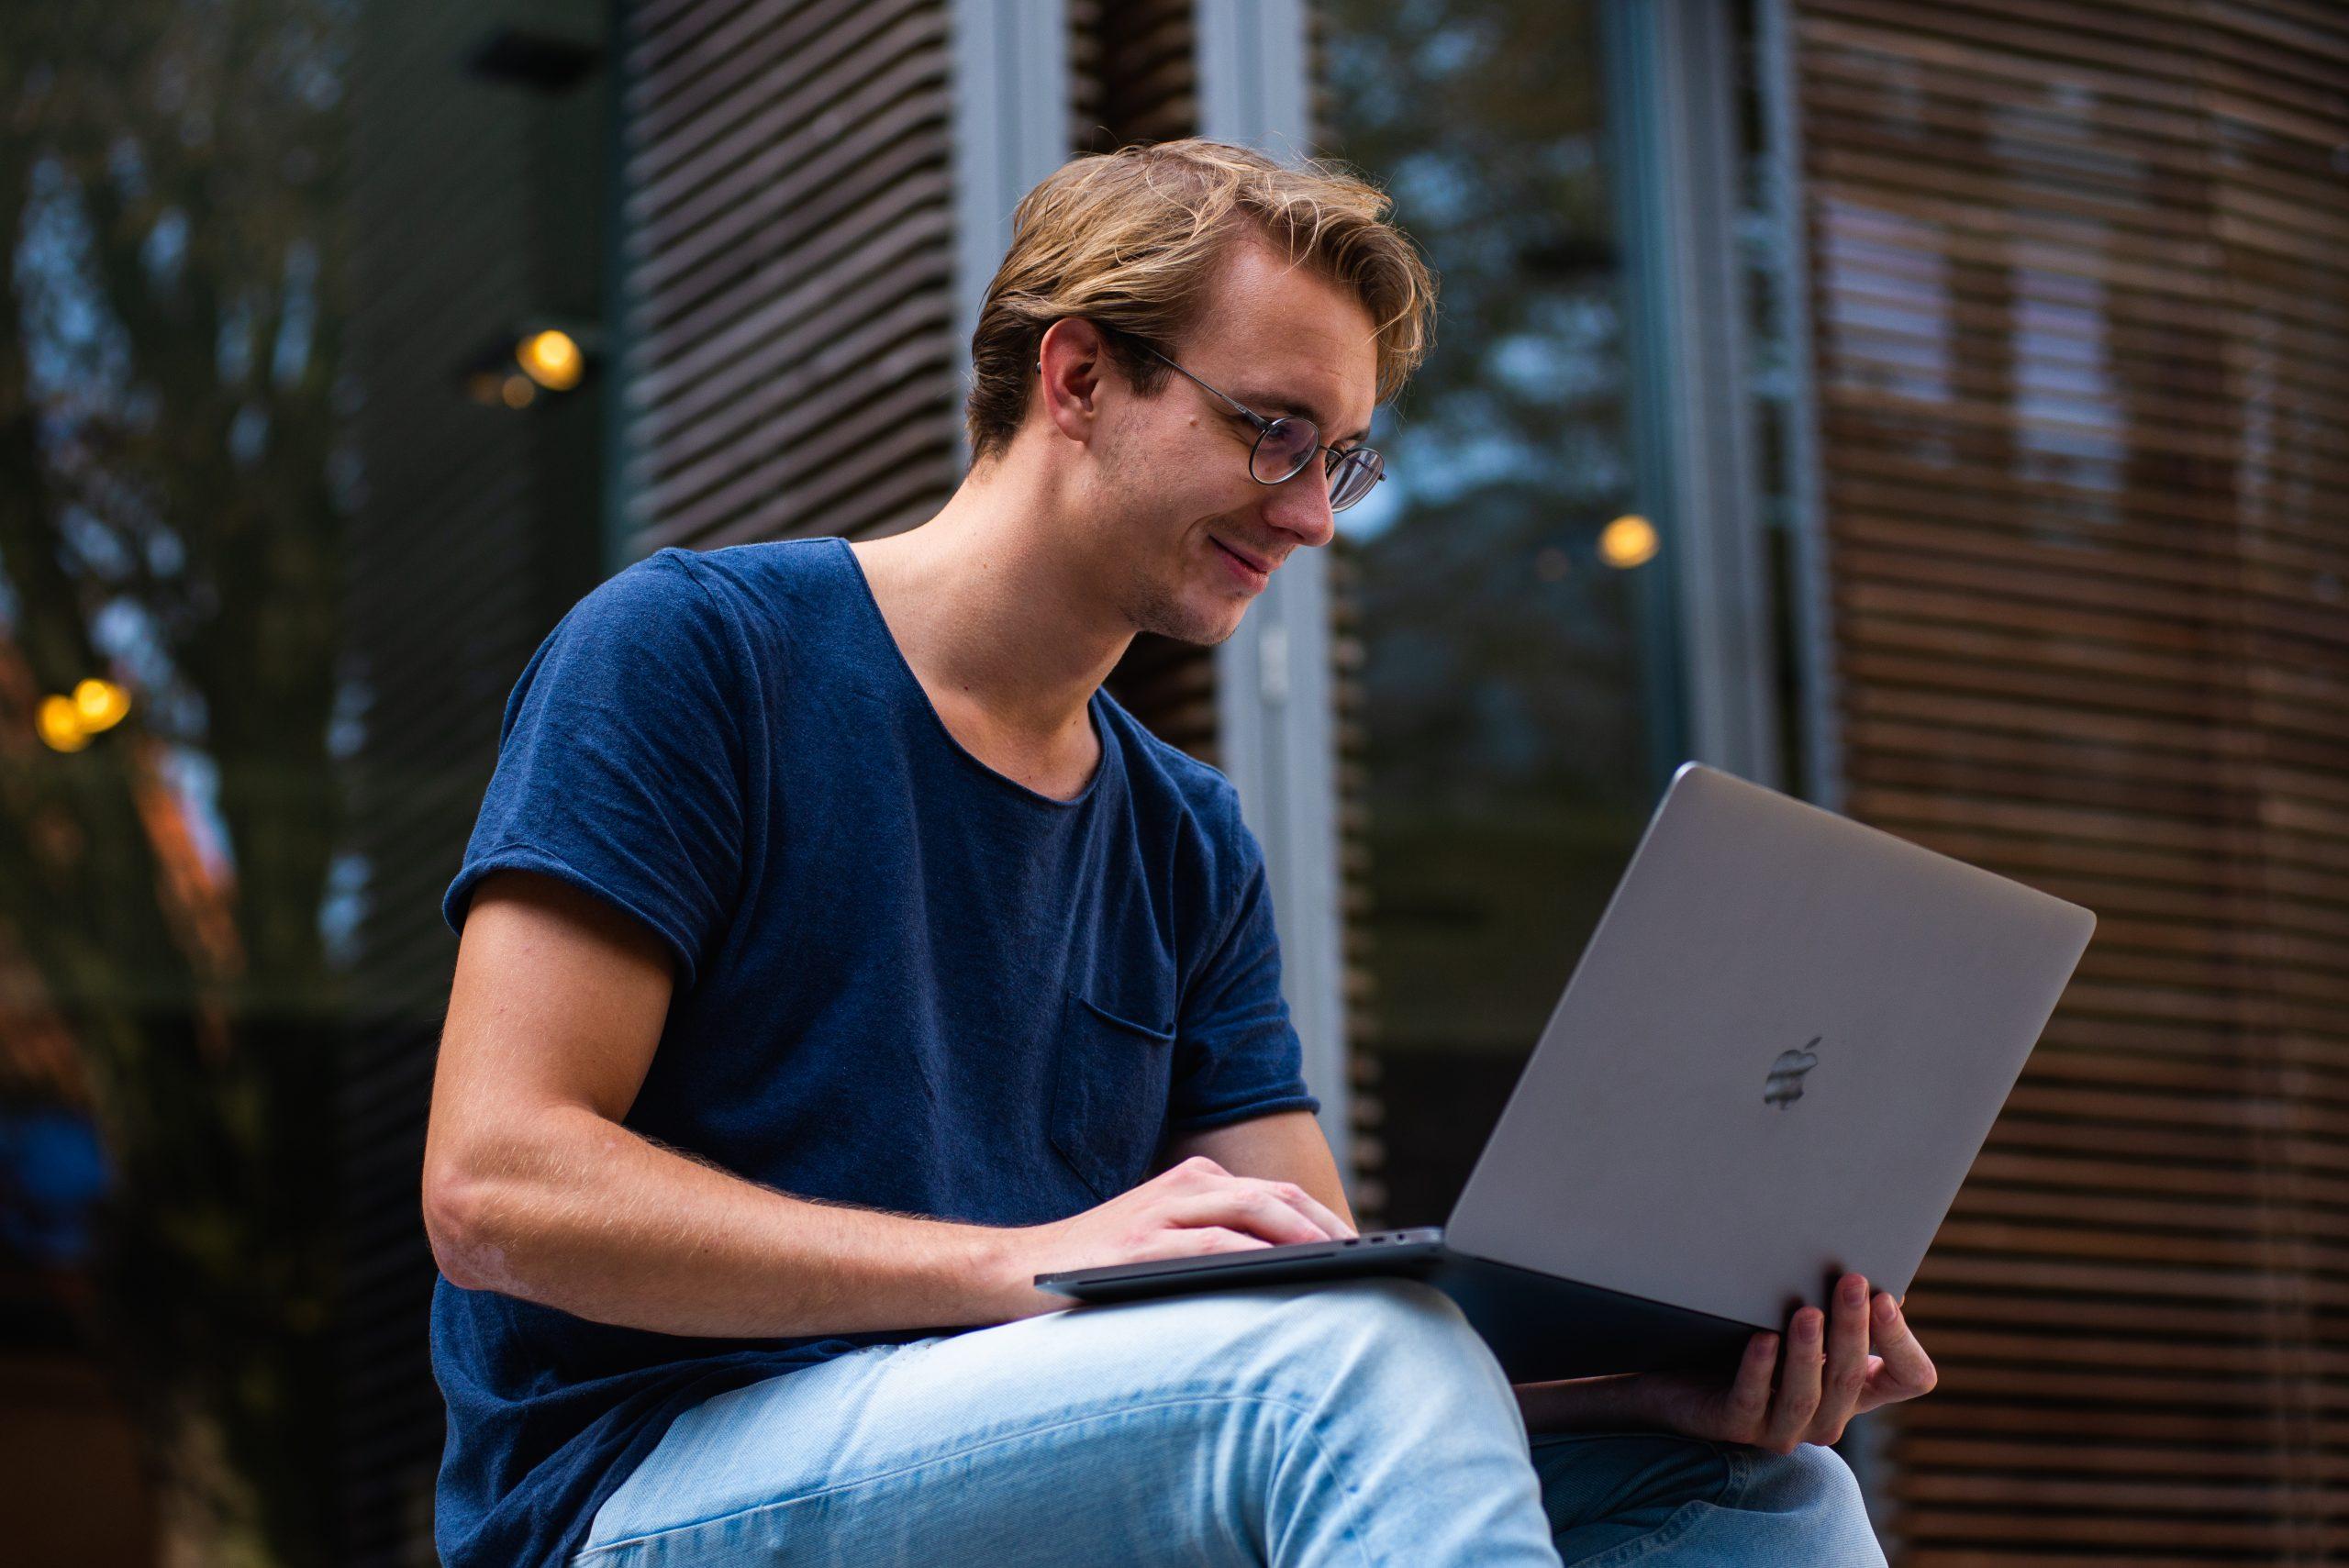 Selective focus photo of man using laptop